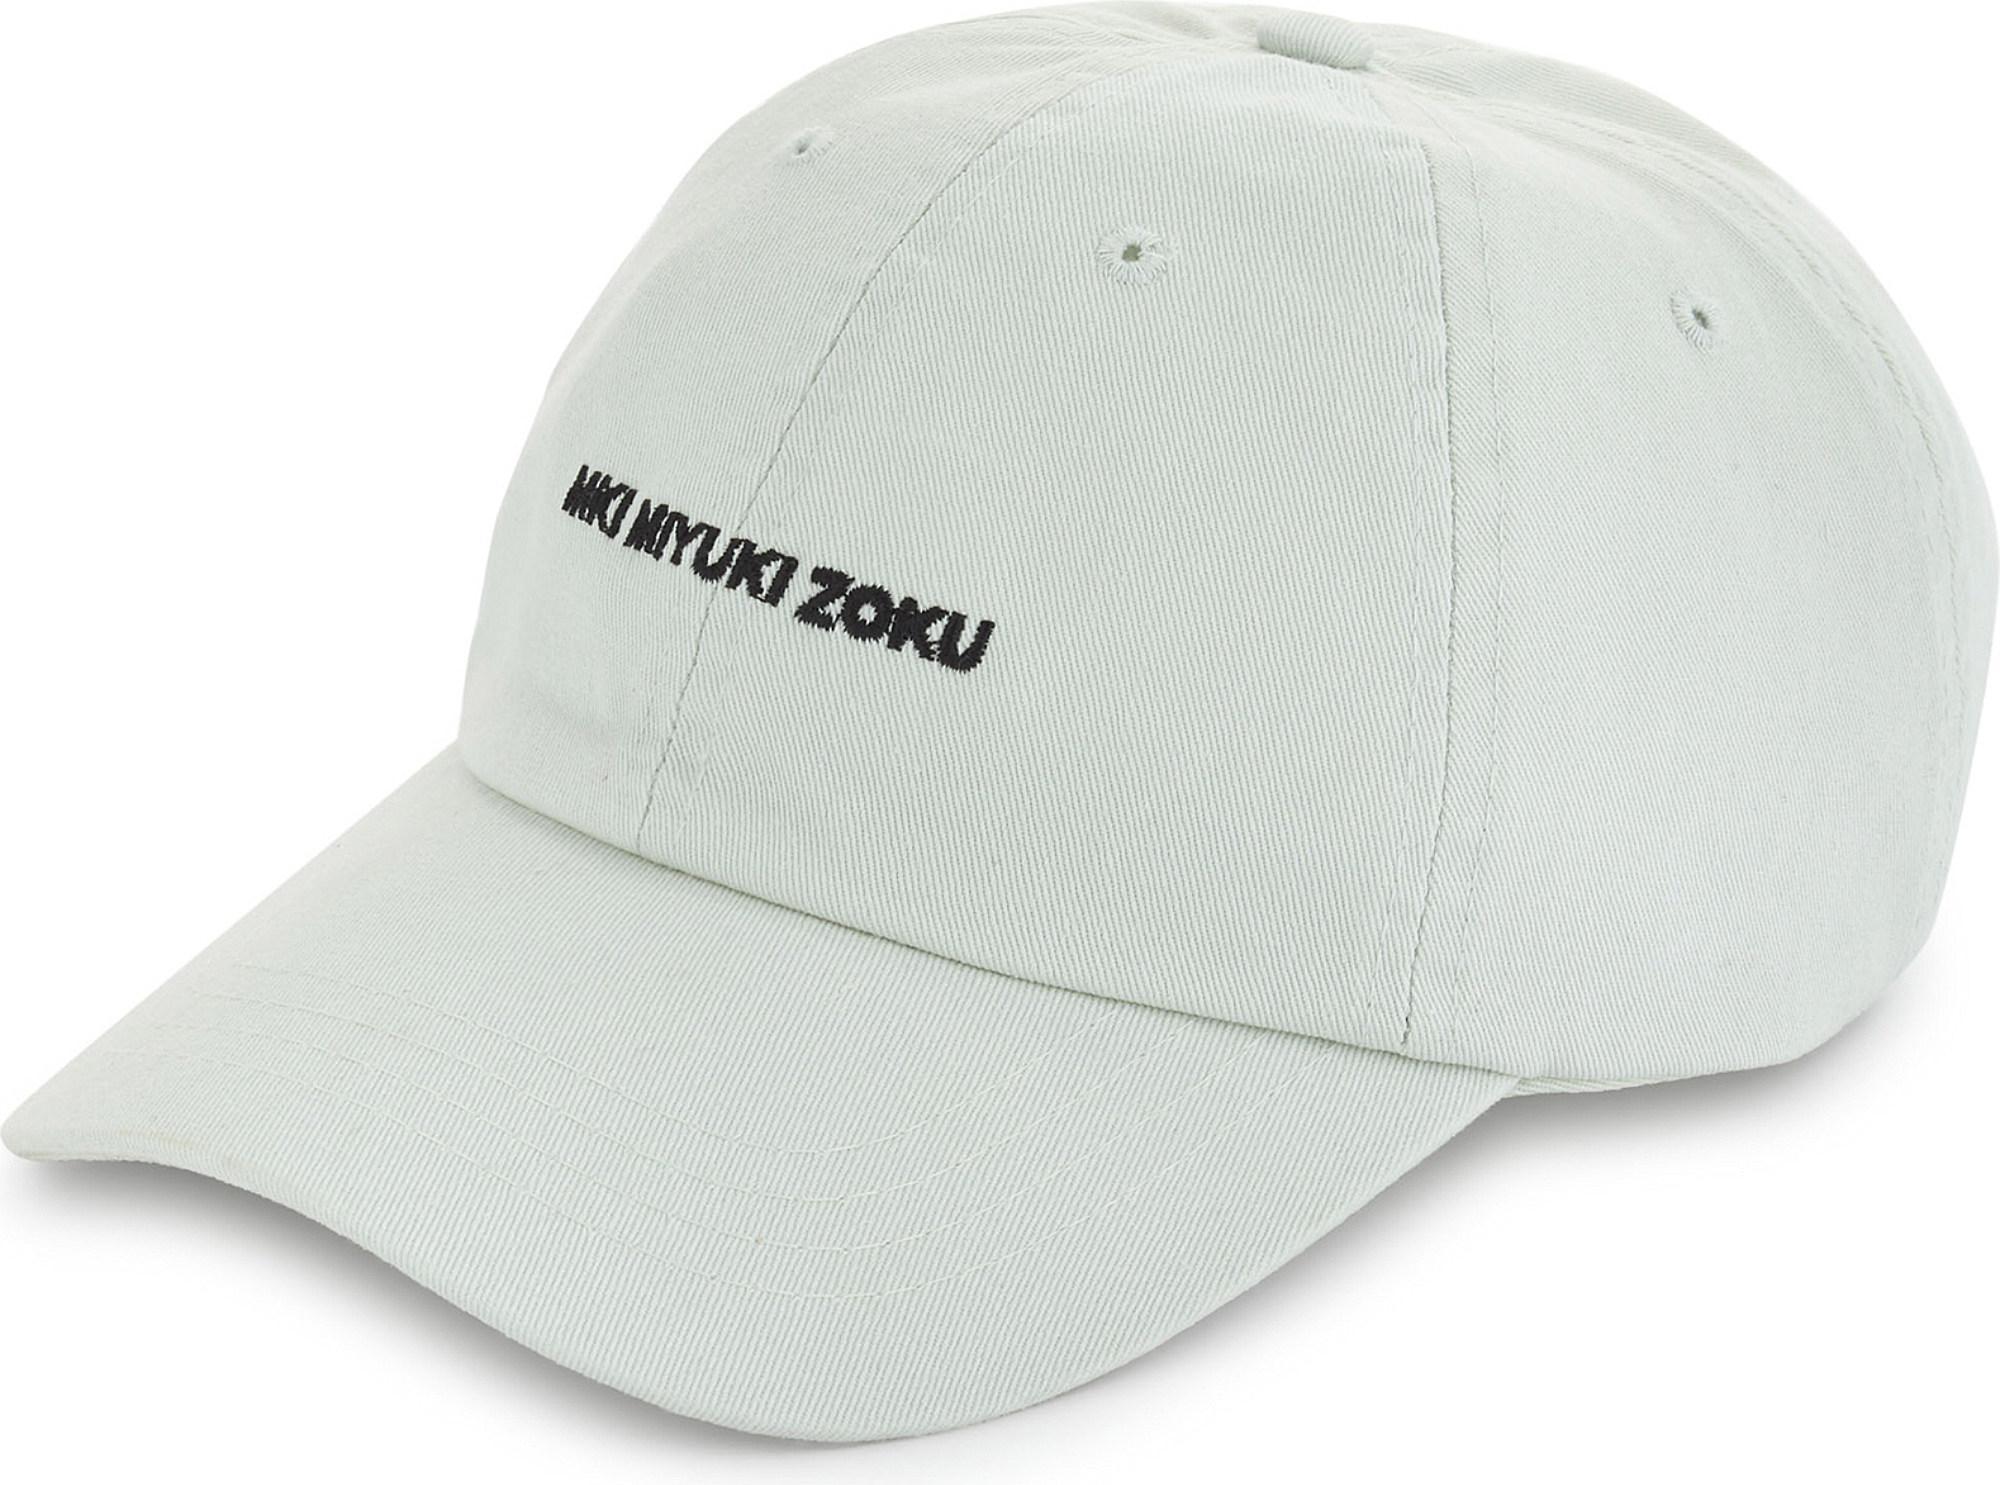 Lyst - MKI Miyuki-Zoku Logo Cotton Cap for Men c80f682a45b2